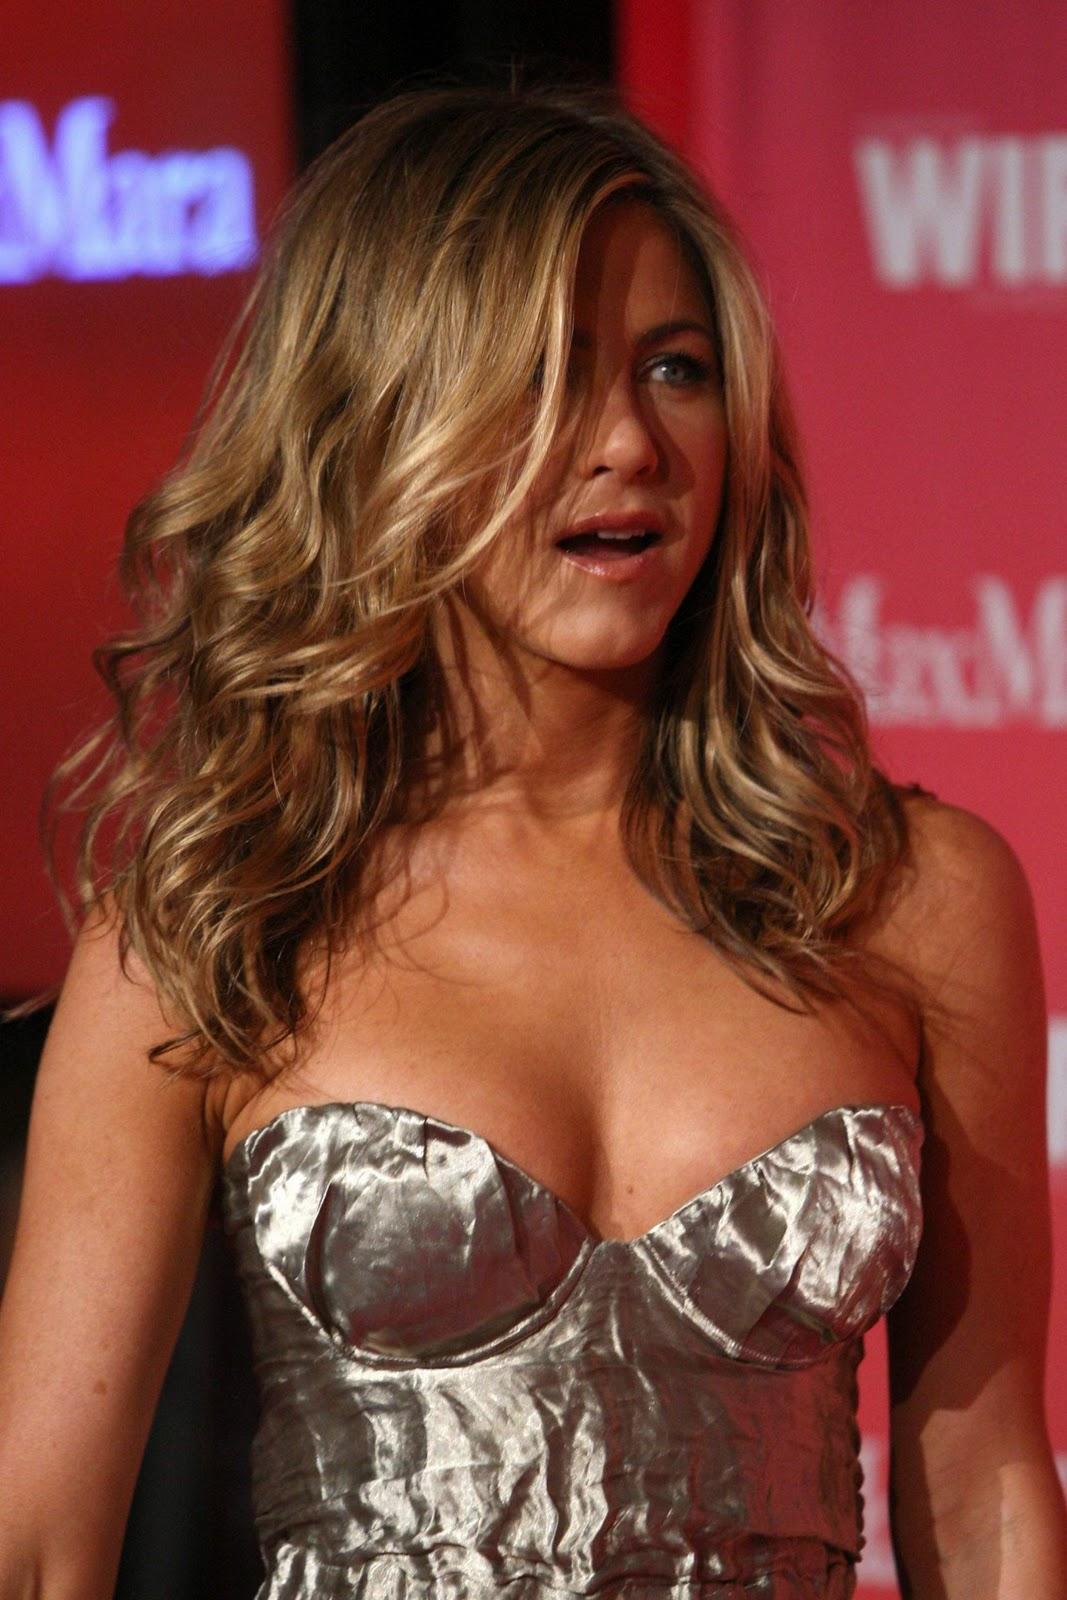 http://2.bp.blogspot.com/__UKa_QKl9dE/TUFXkicNICI/AAAAAAAAB1w/LHgxjftGcLs/s1600/Jennifer+Aniston%257Bilovemediafire.blogspot.com%257D++%25286%2529.jpg